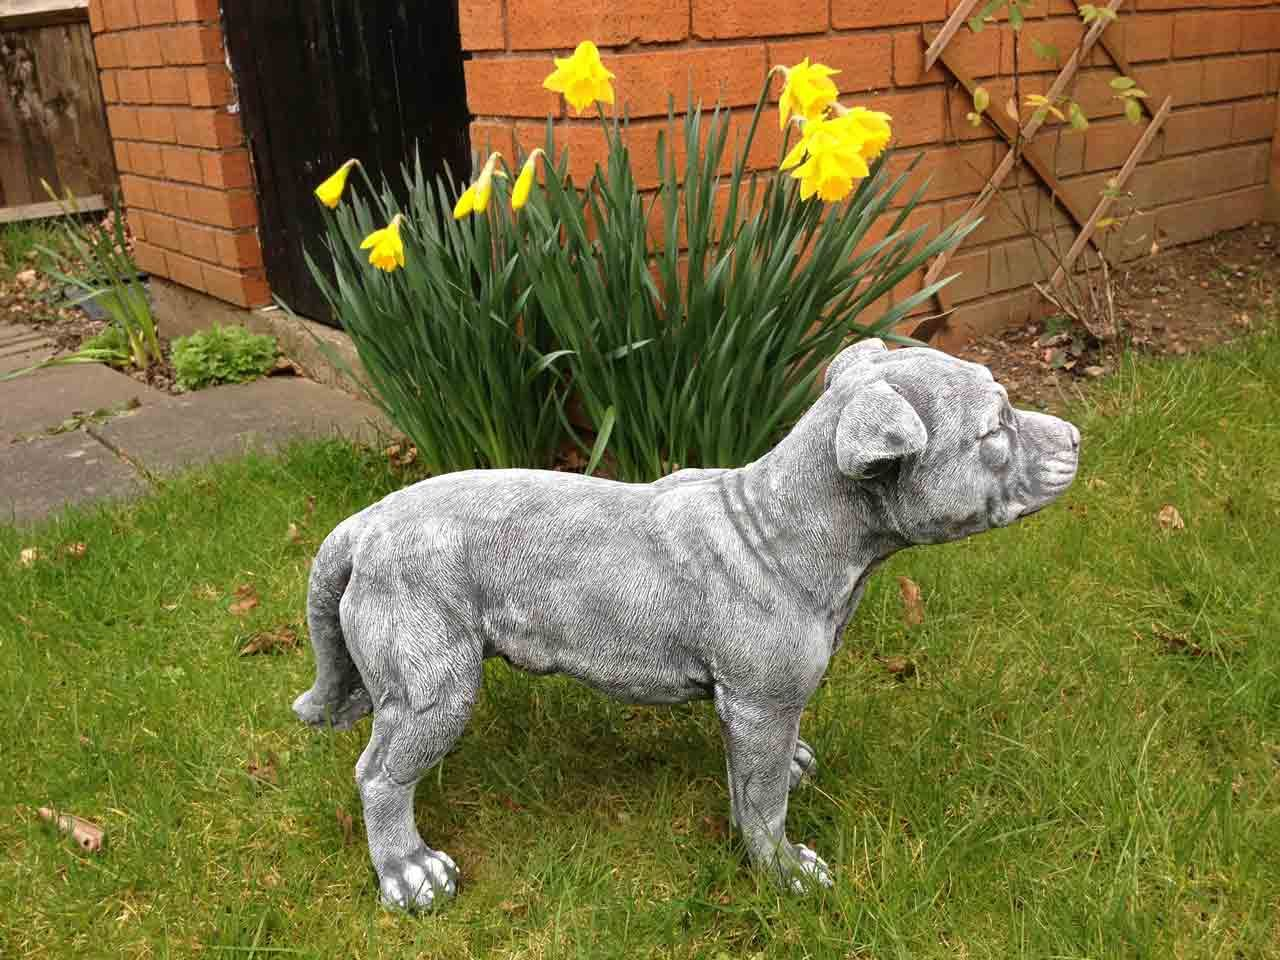 Heron garden ornament - Staffordshire Bull Terrier Ornament